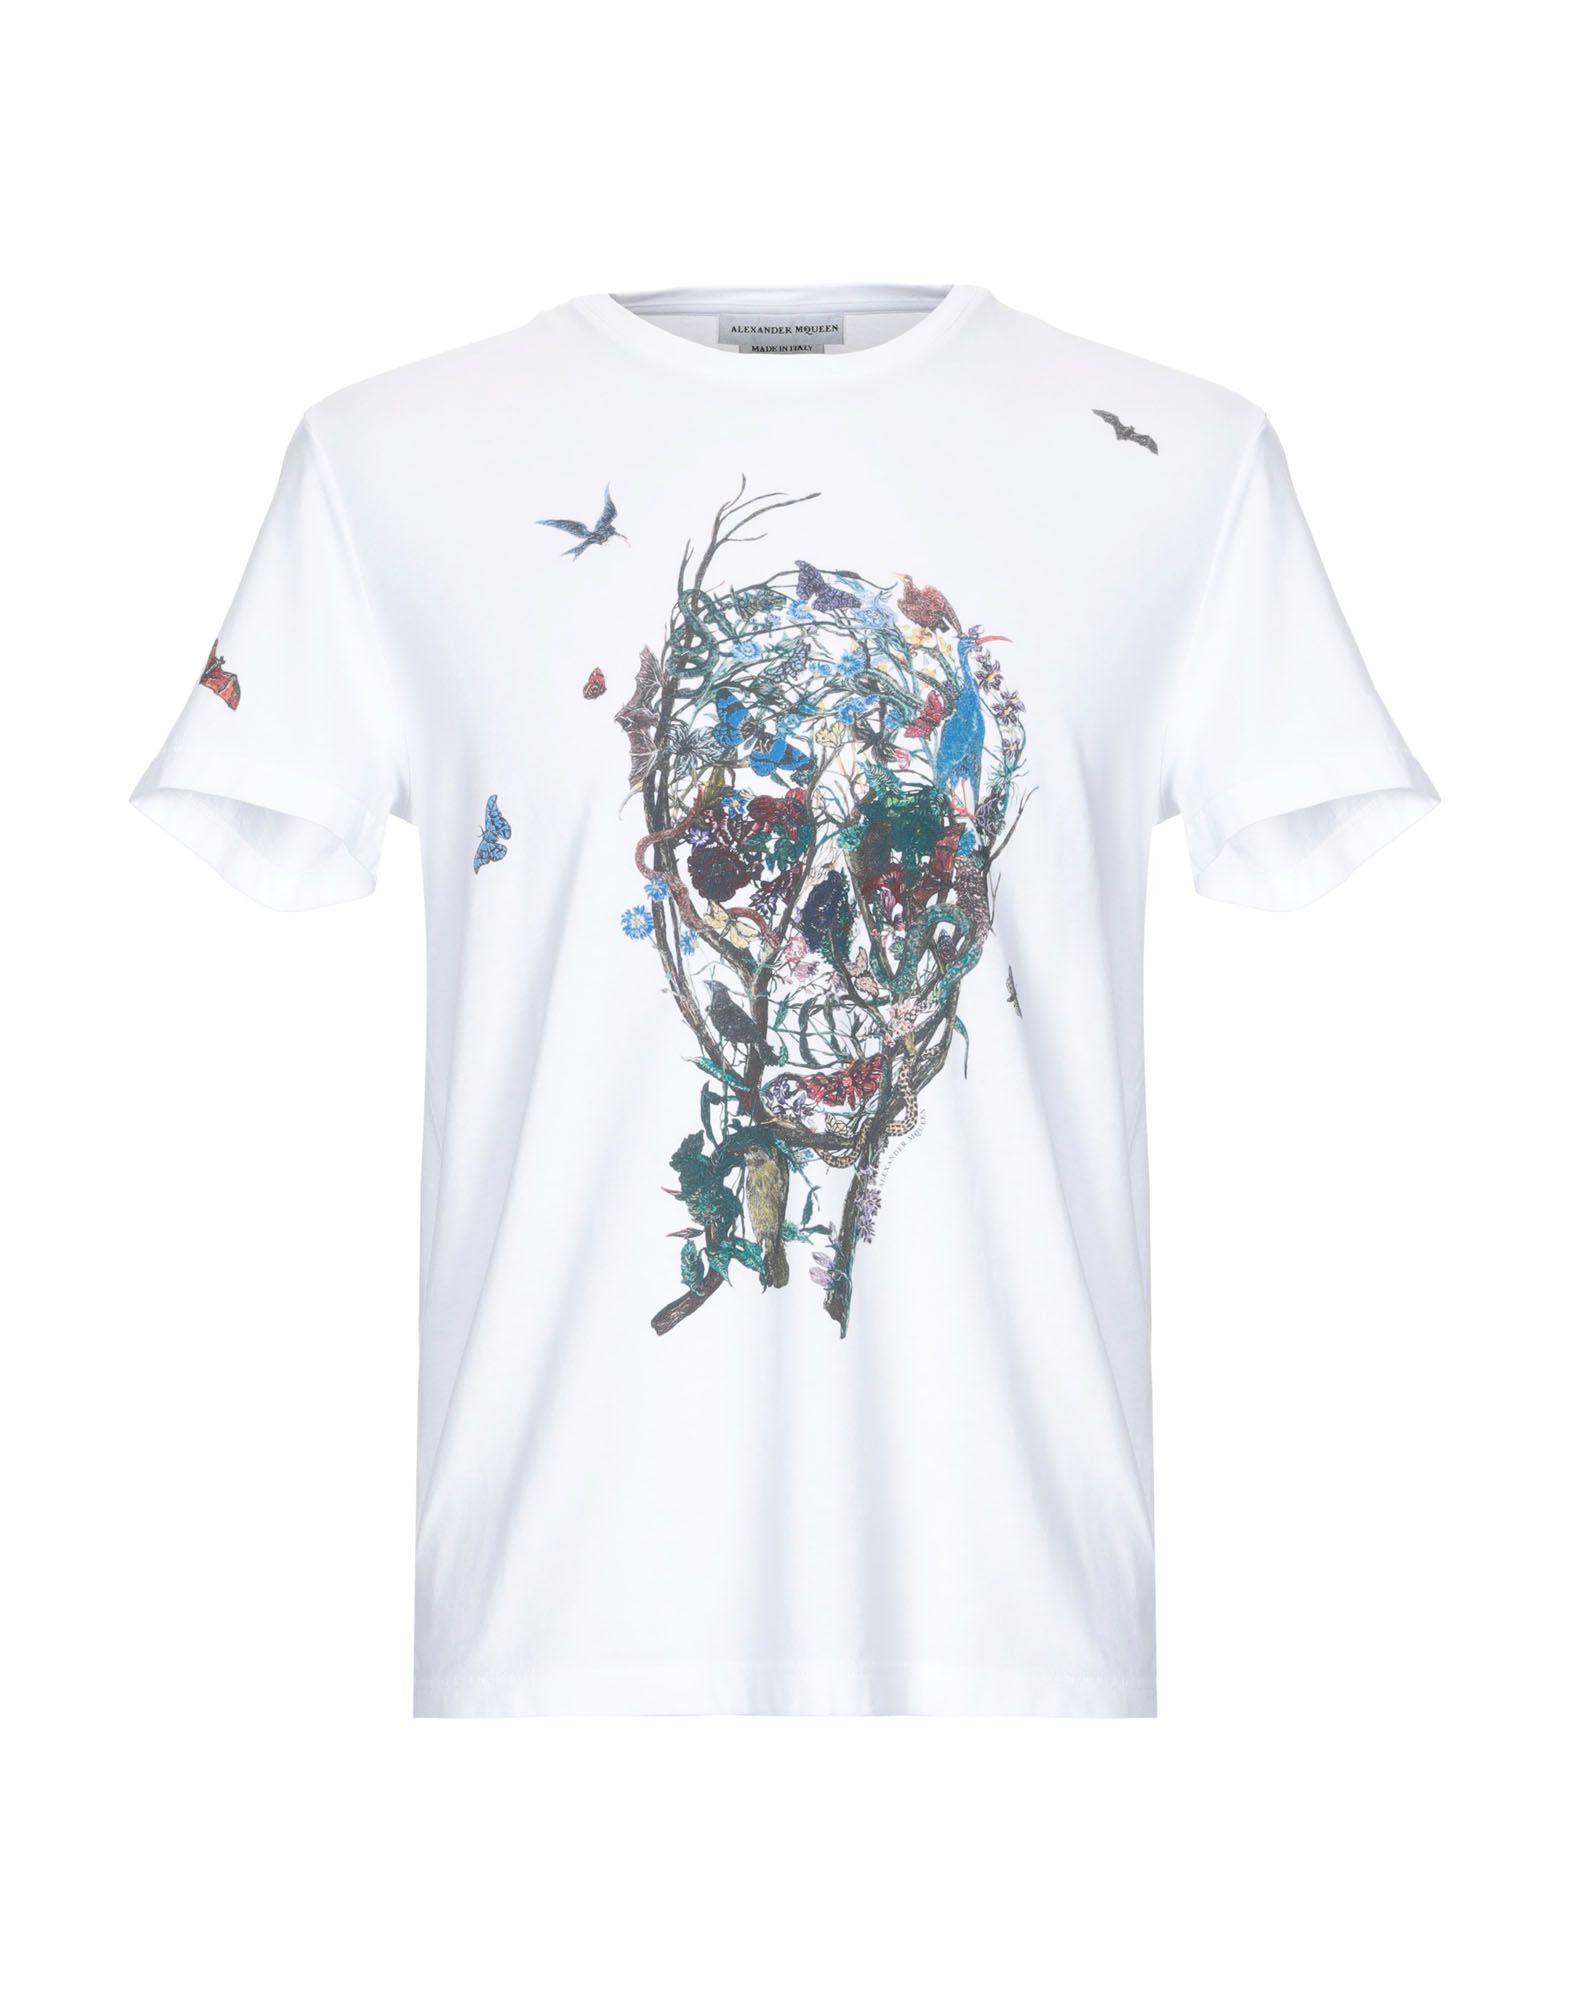 the latest 6631b cd684 ALEXANDER MCQUEEN T-shirt - T-Shirts and Tops   YOOX.COM